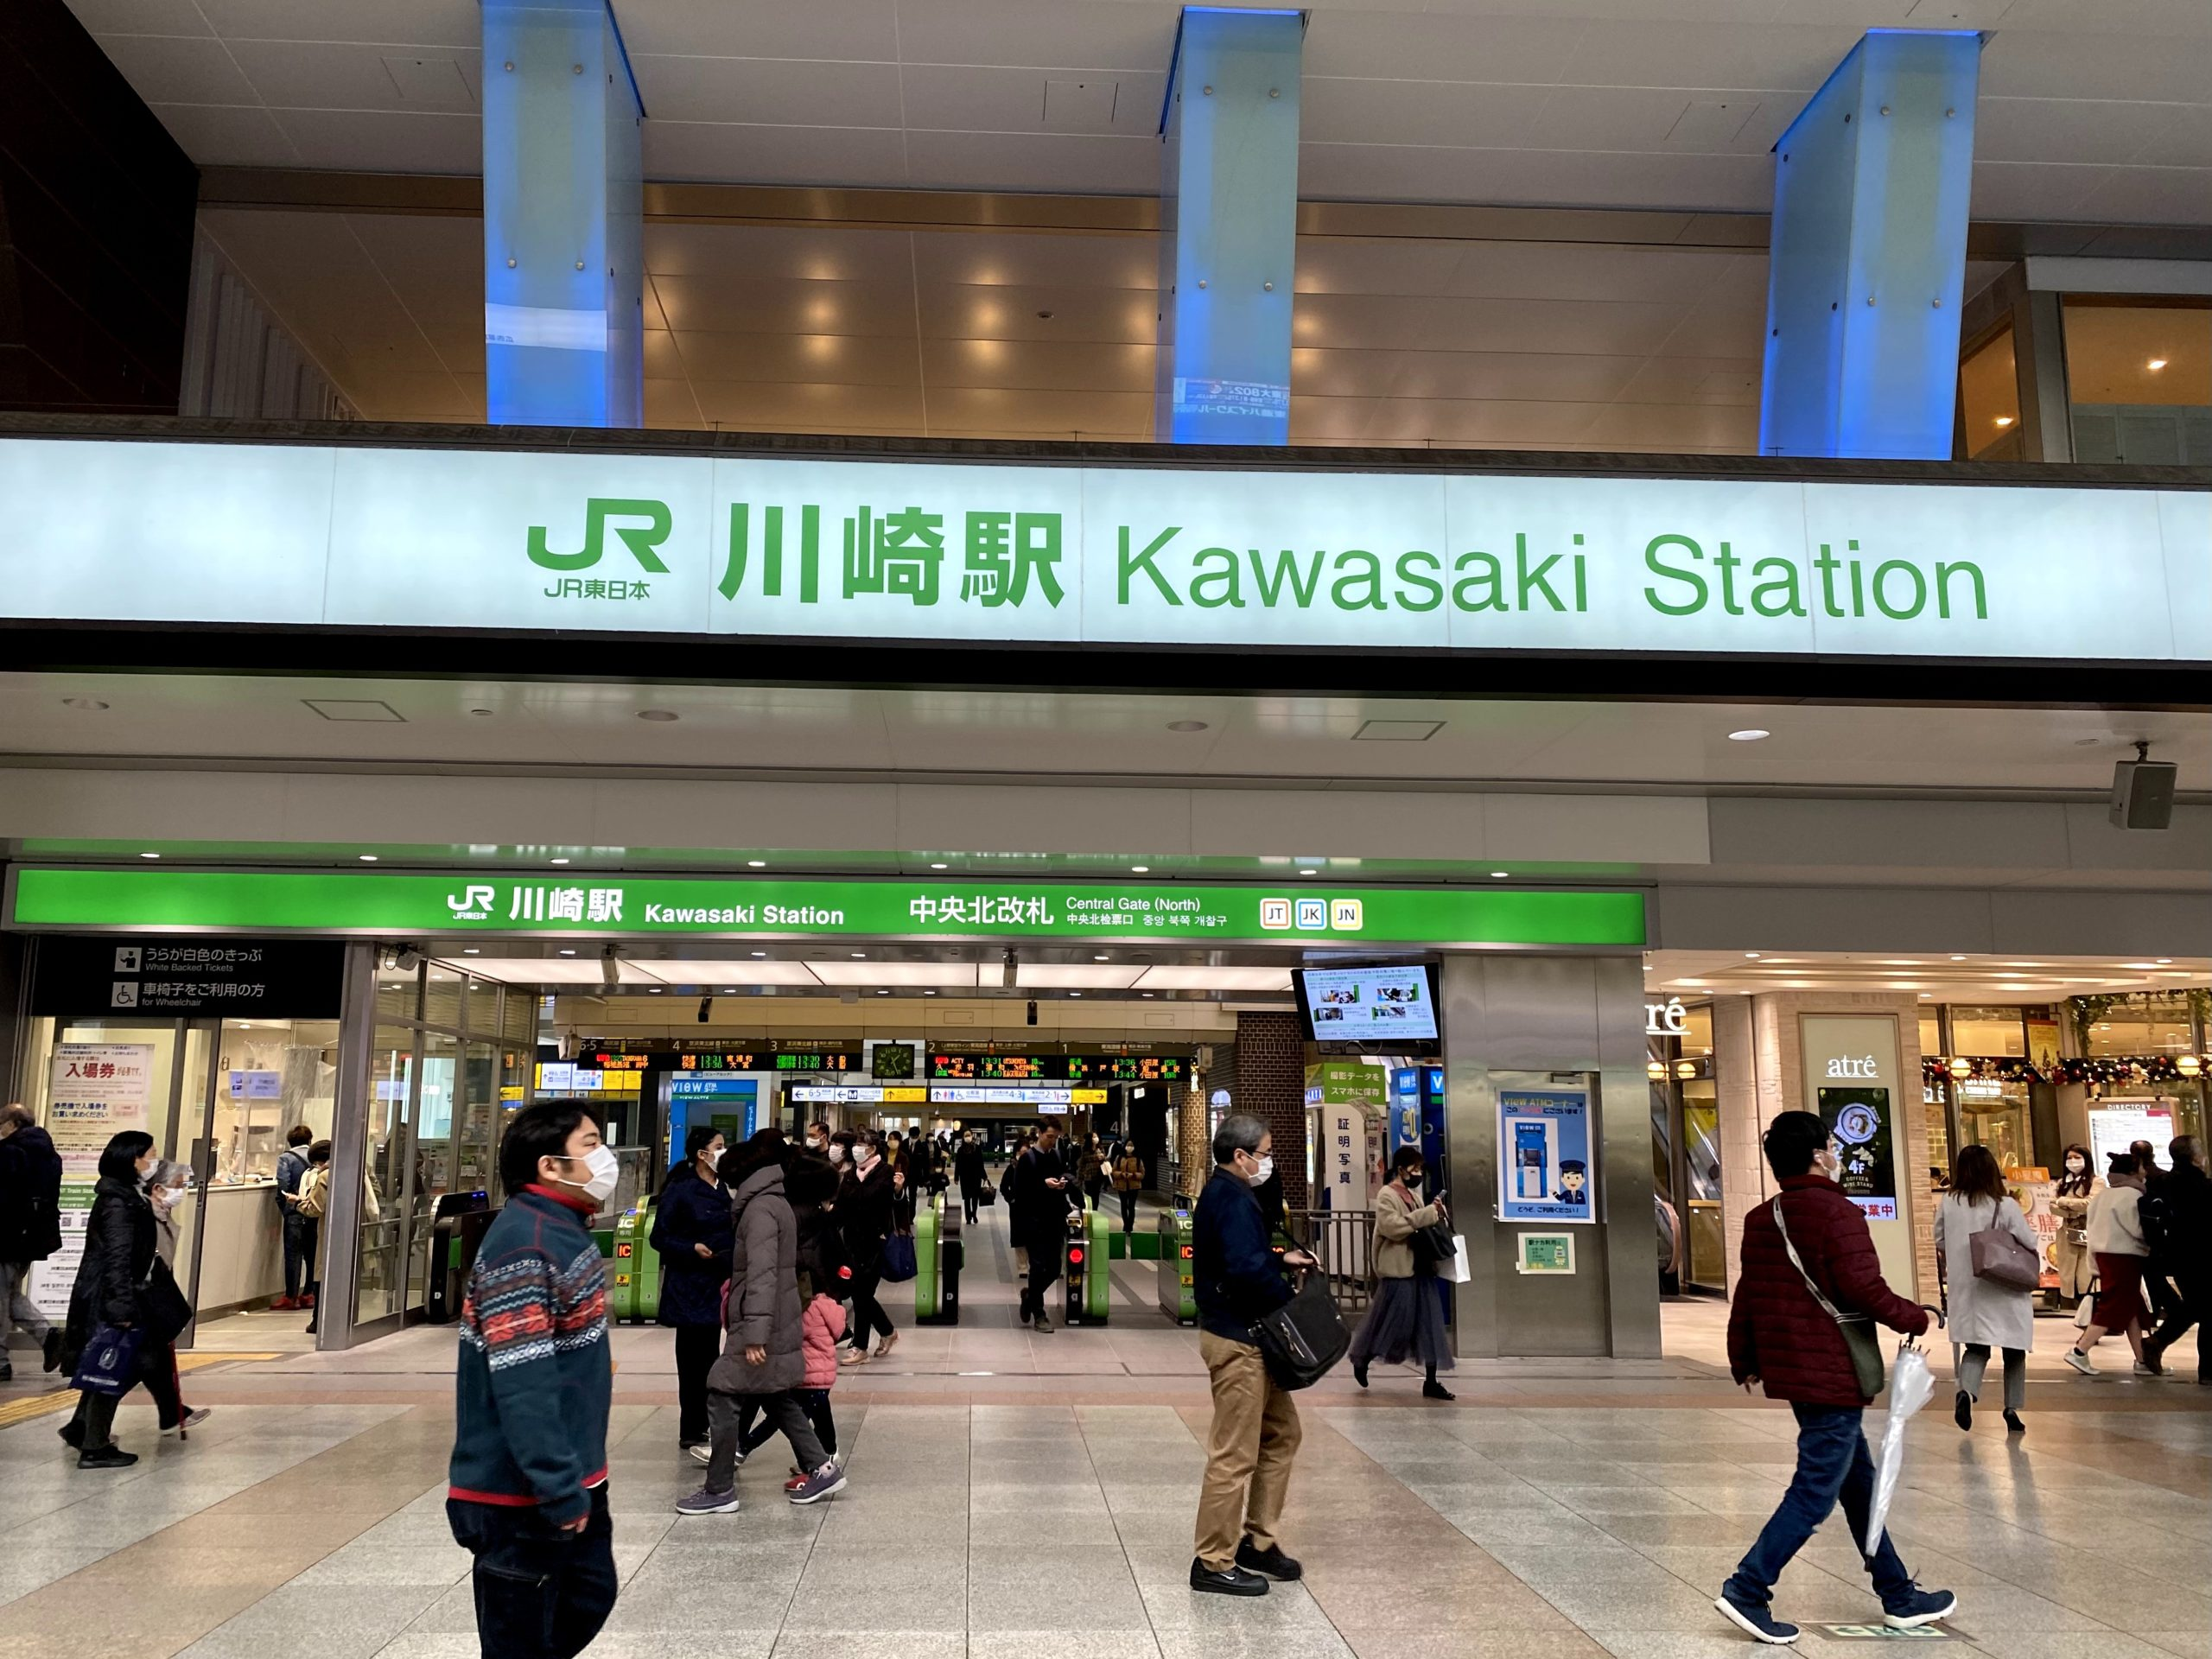 JR川崎駅中央北改札を背にして右へ進みます